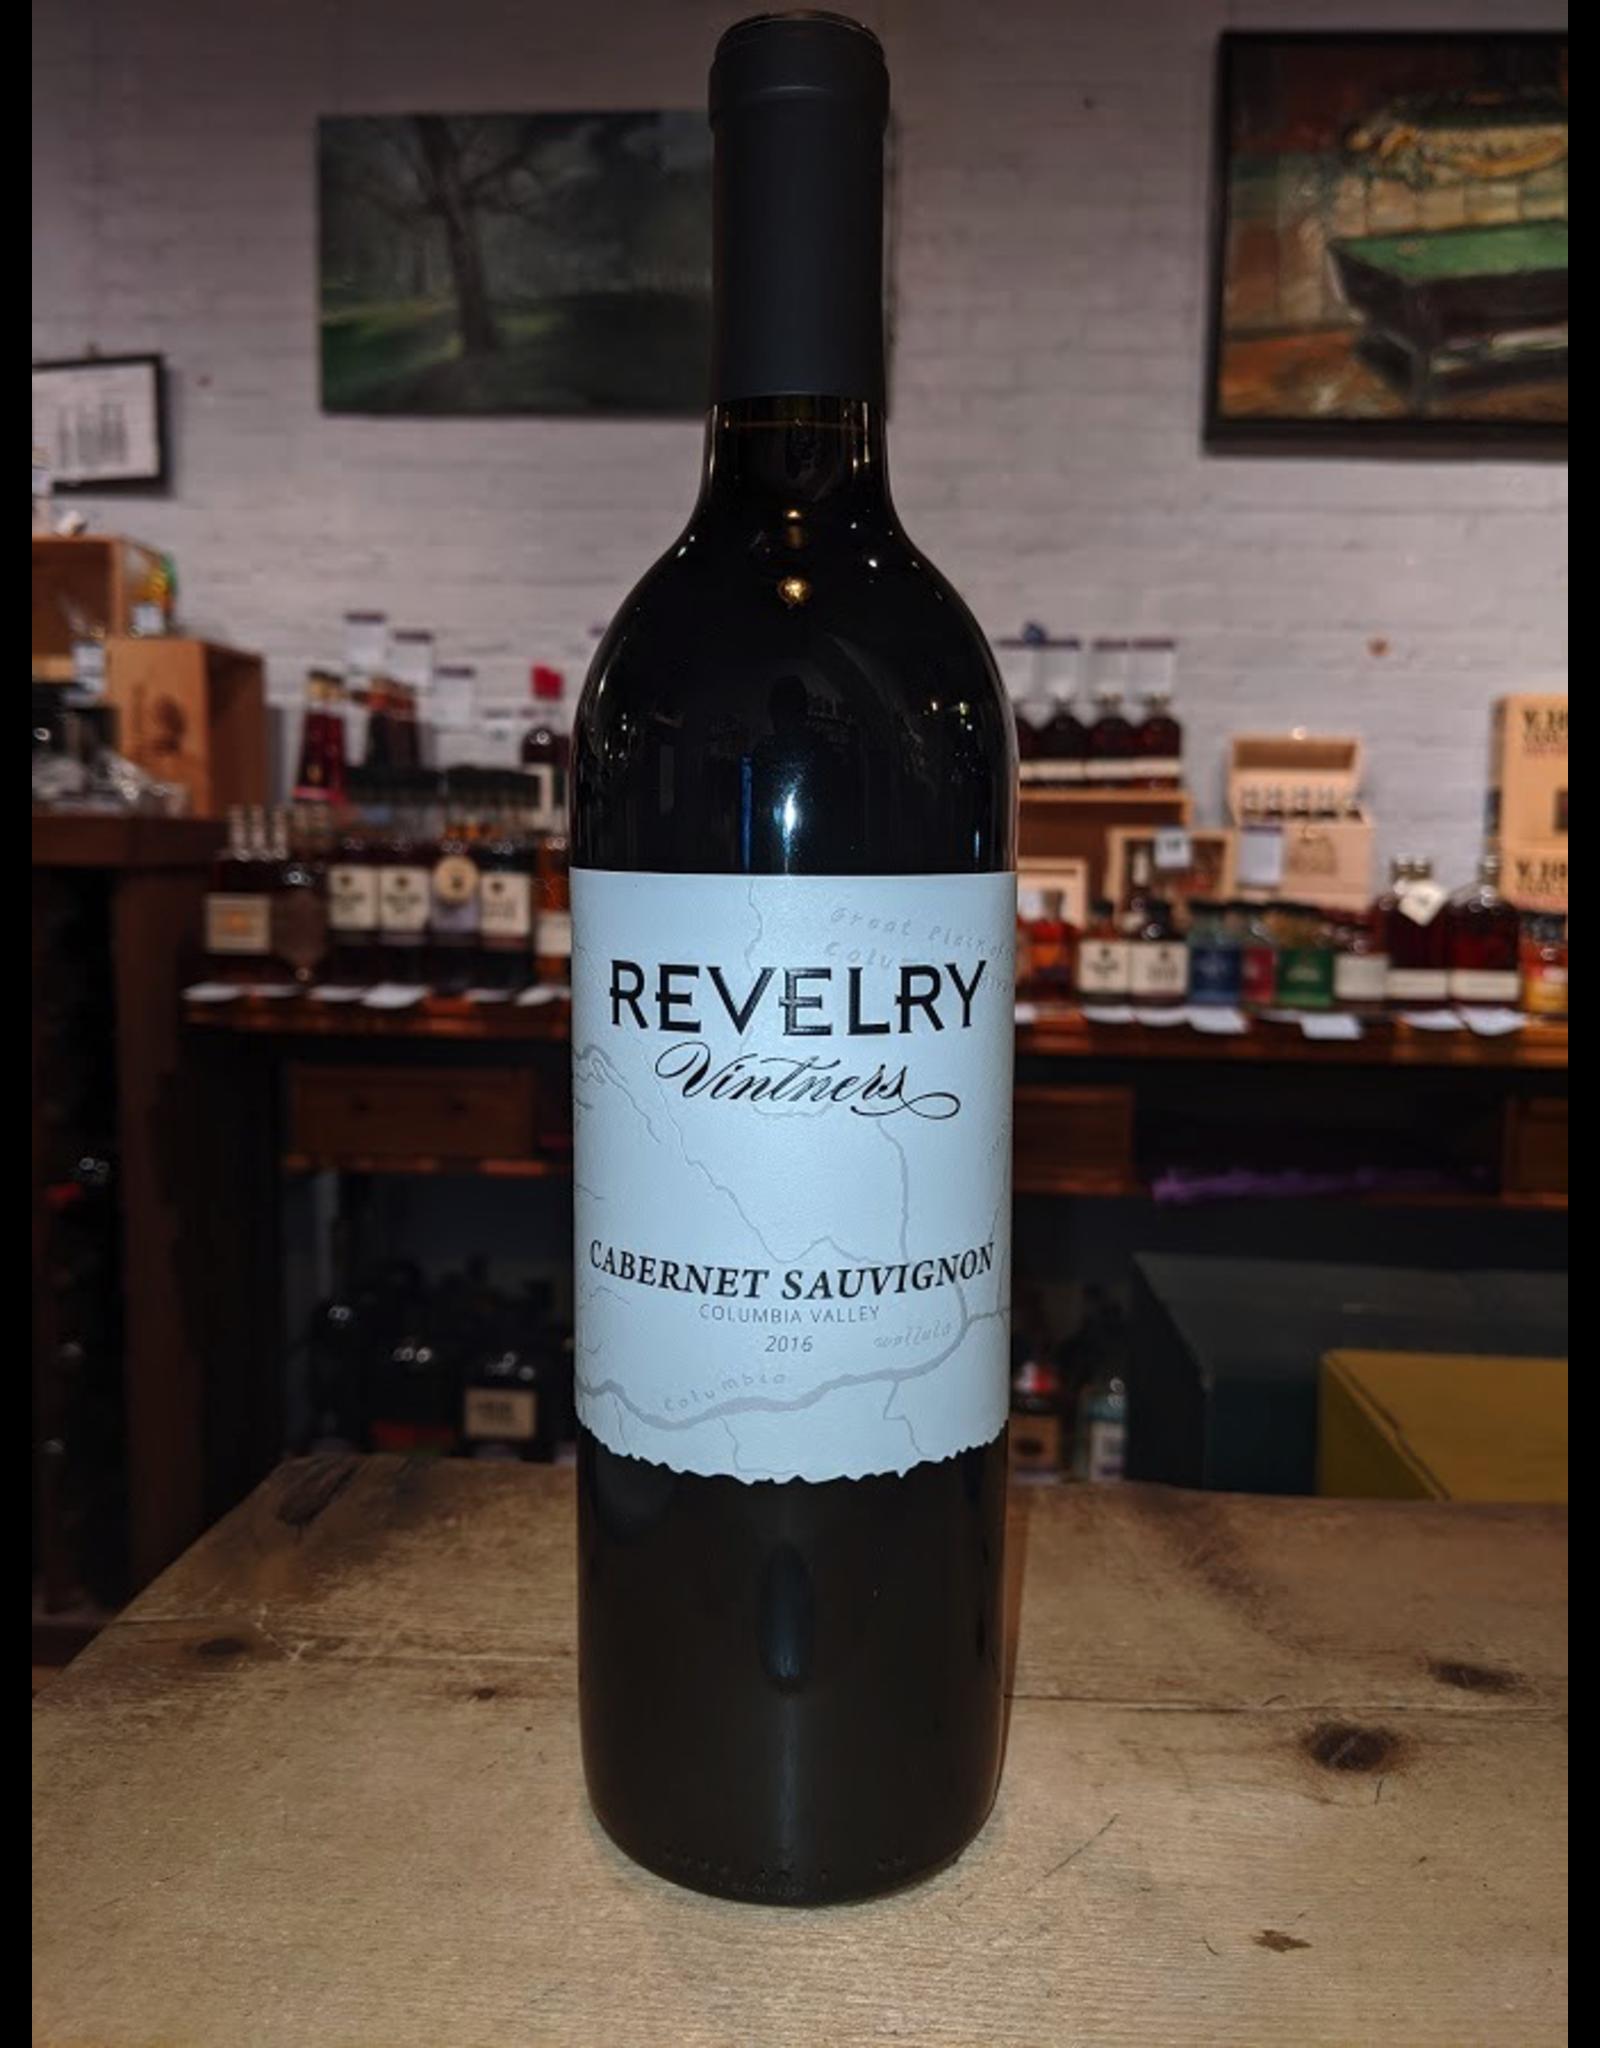 2016 Revelry Cabernet Sauvignon - Washington, USA